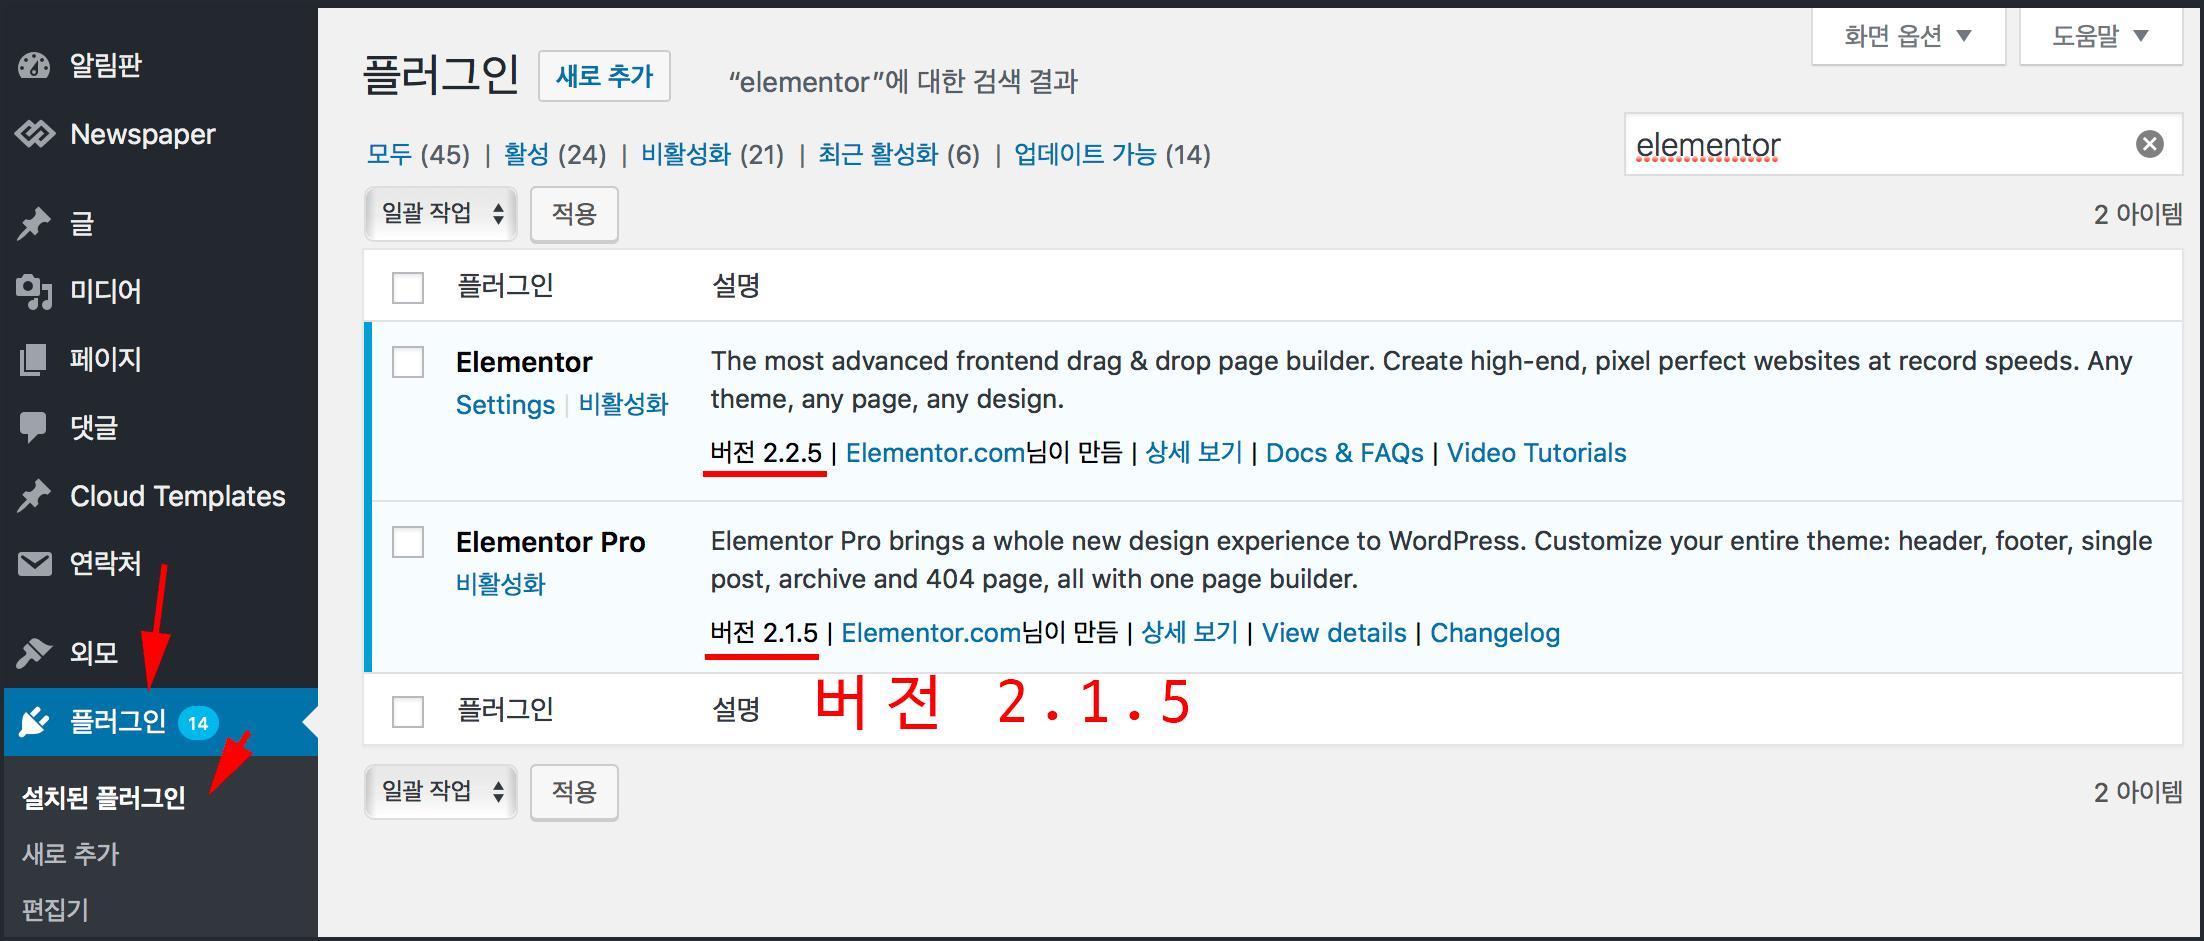 Eleemntor 버전 2.1.5